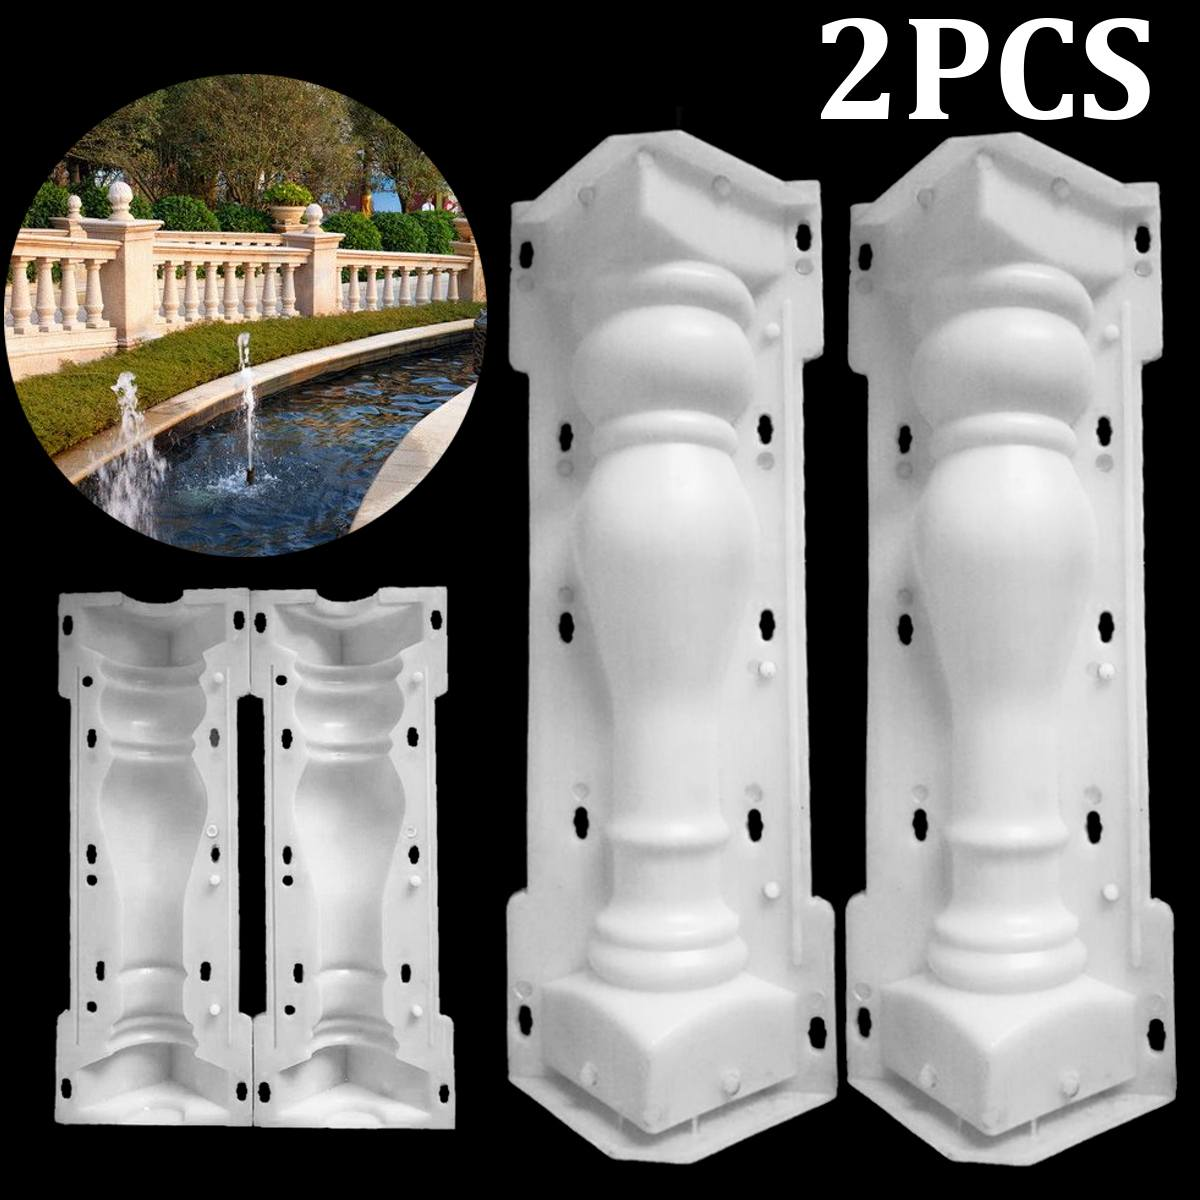 Serenity prayer mold plaster concrete casting garden mould